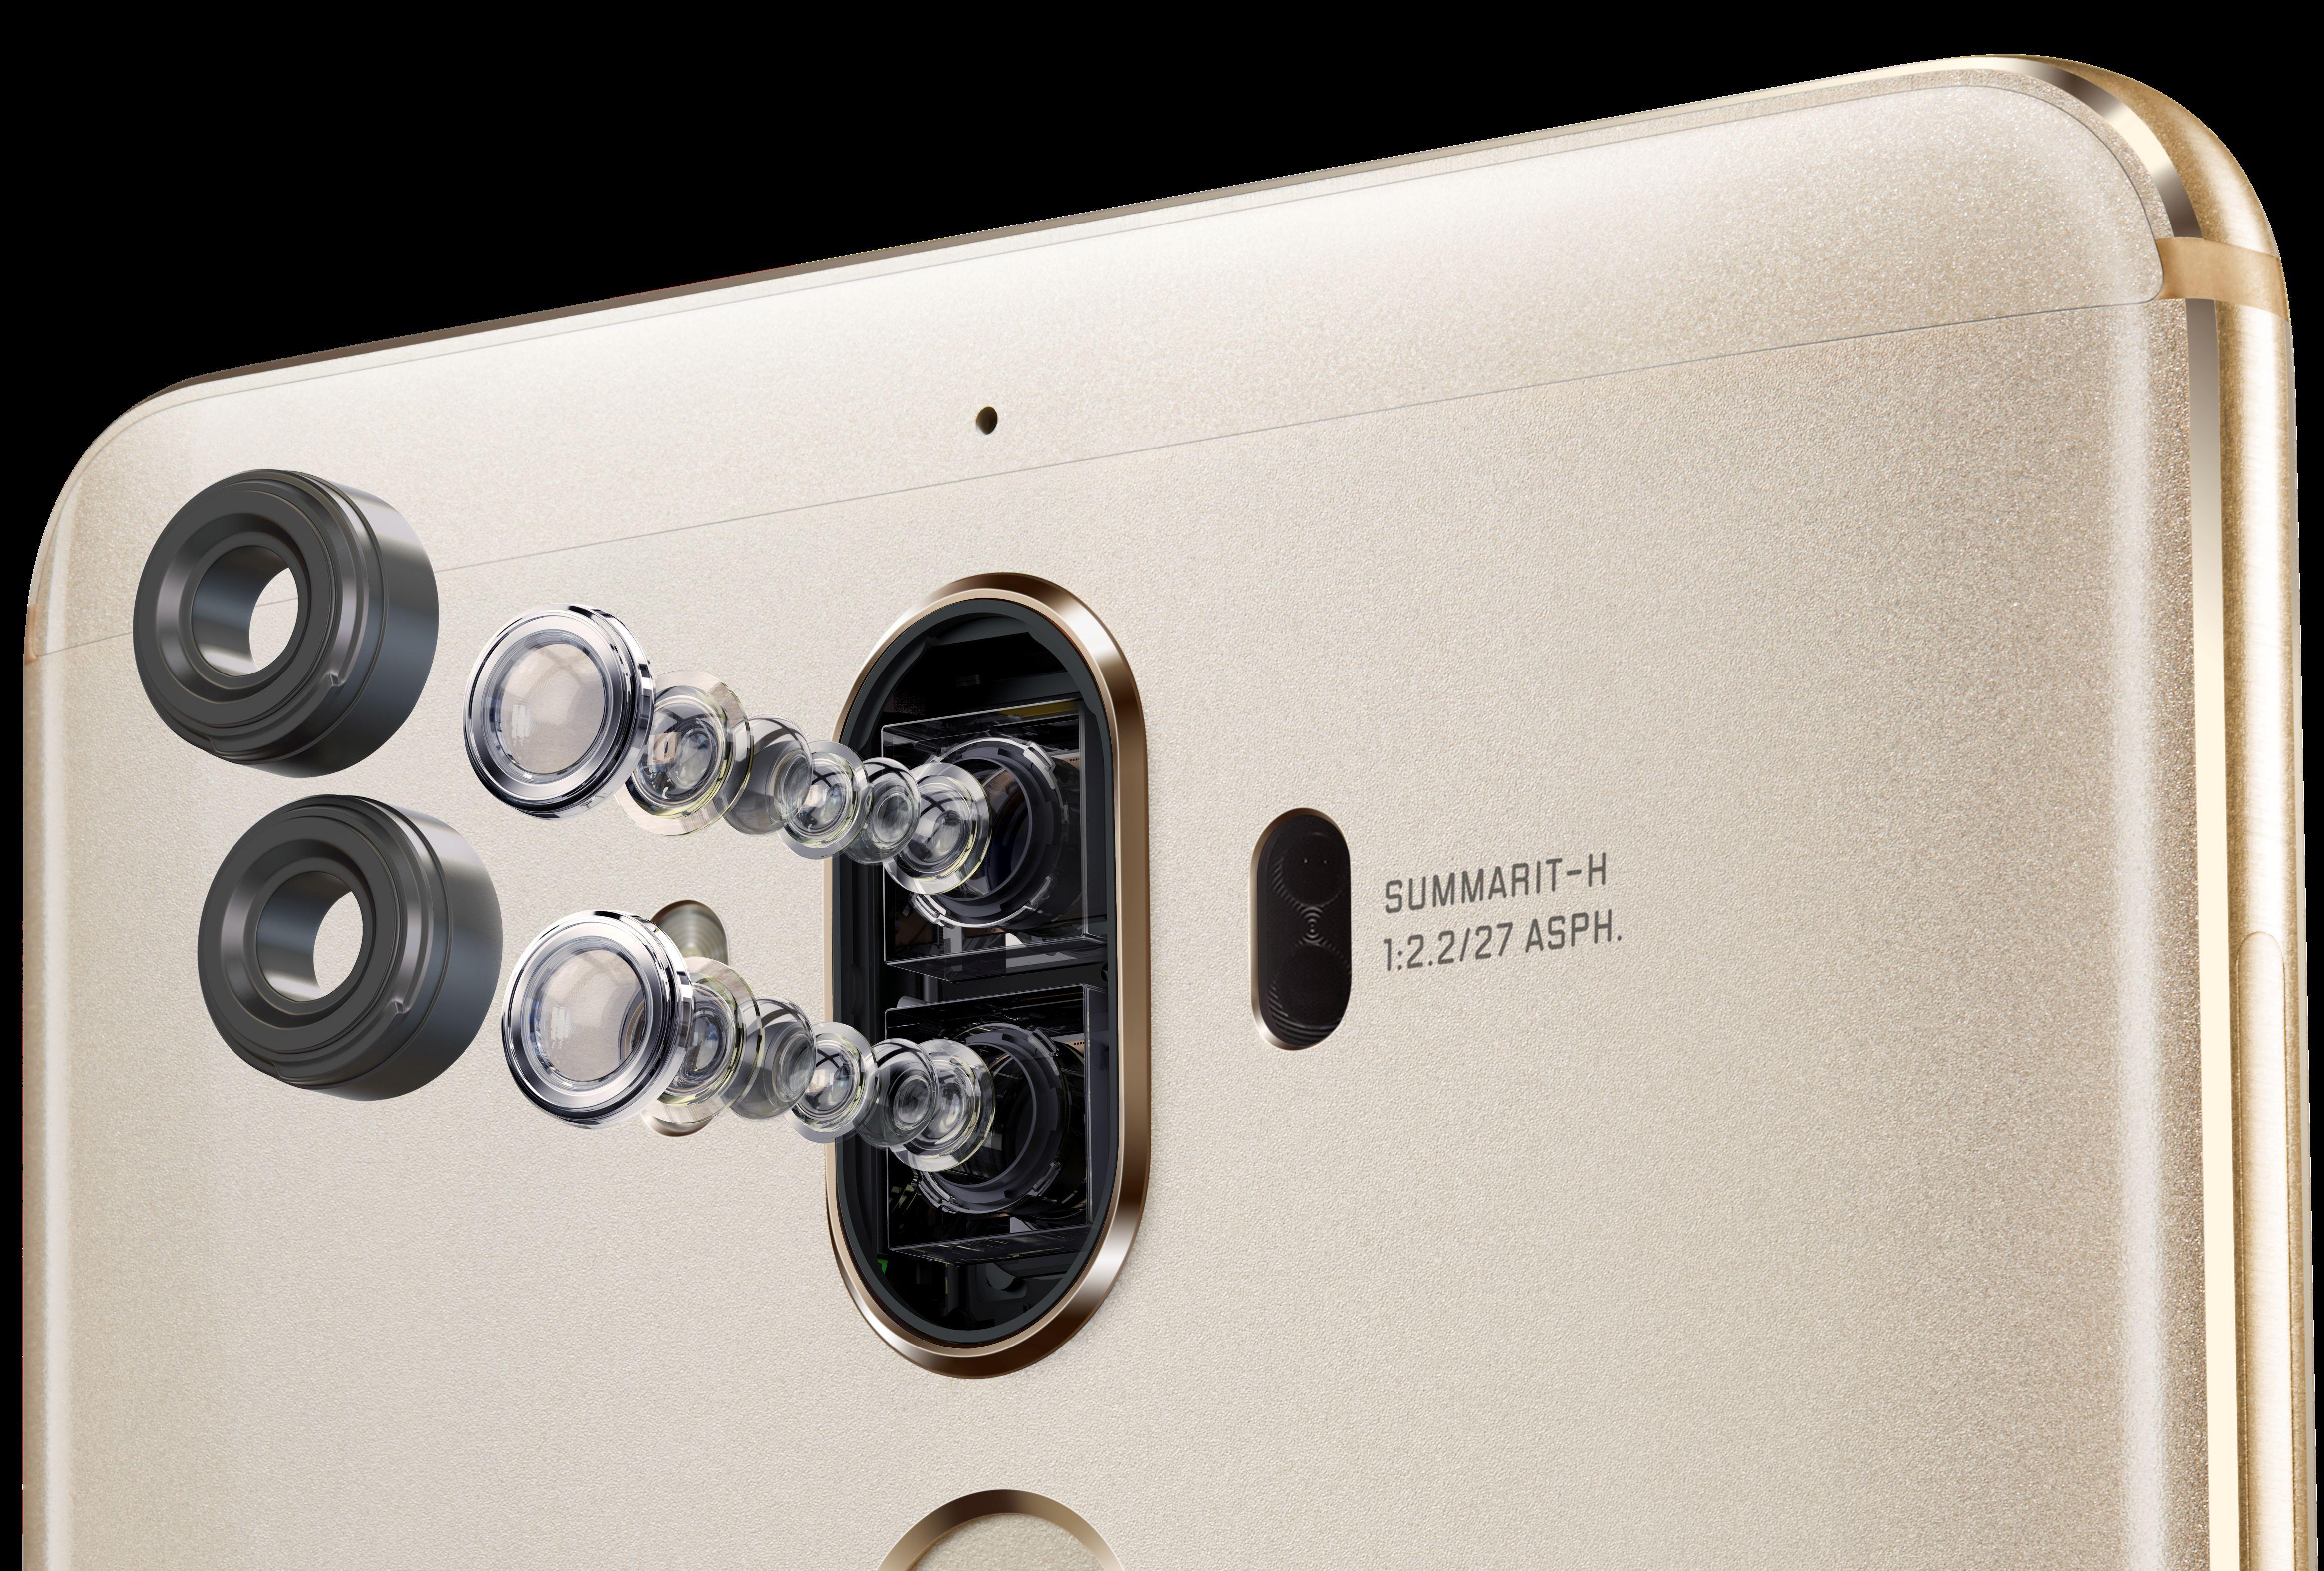 كاميرا مستخدم هاتف هواوى Mate 9